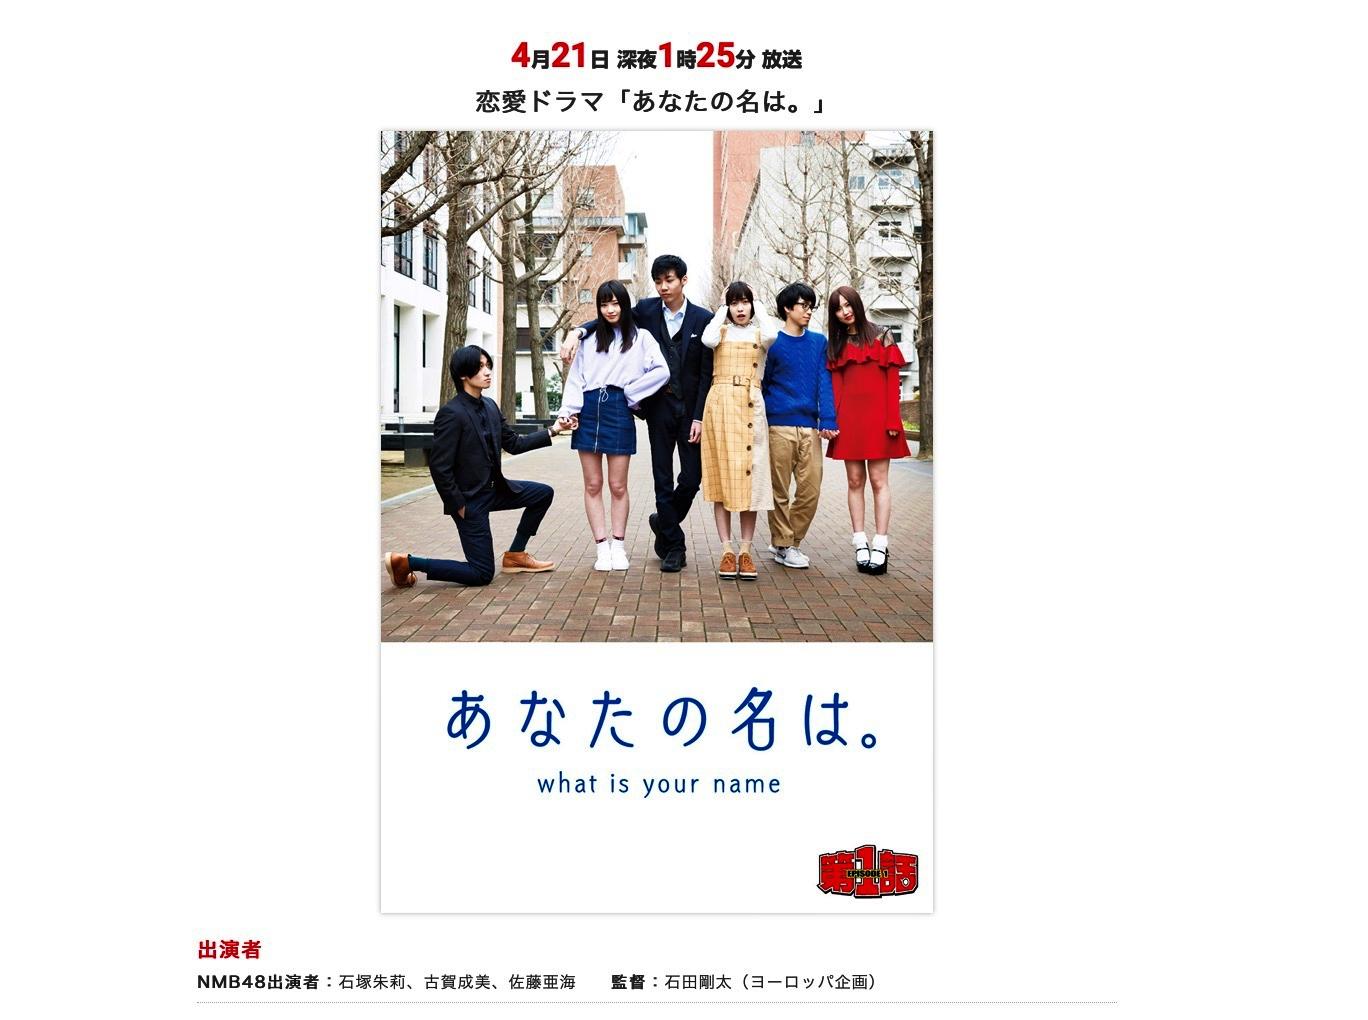 【NMB48】4月21日に#1が放送される[第1話]の番組情報と初回のタイトル・出演者が更新。